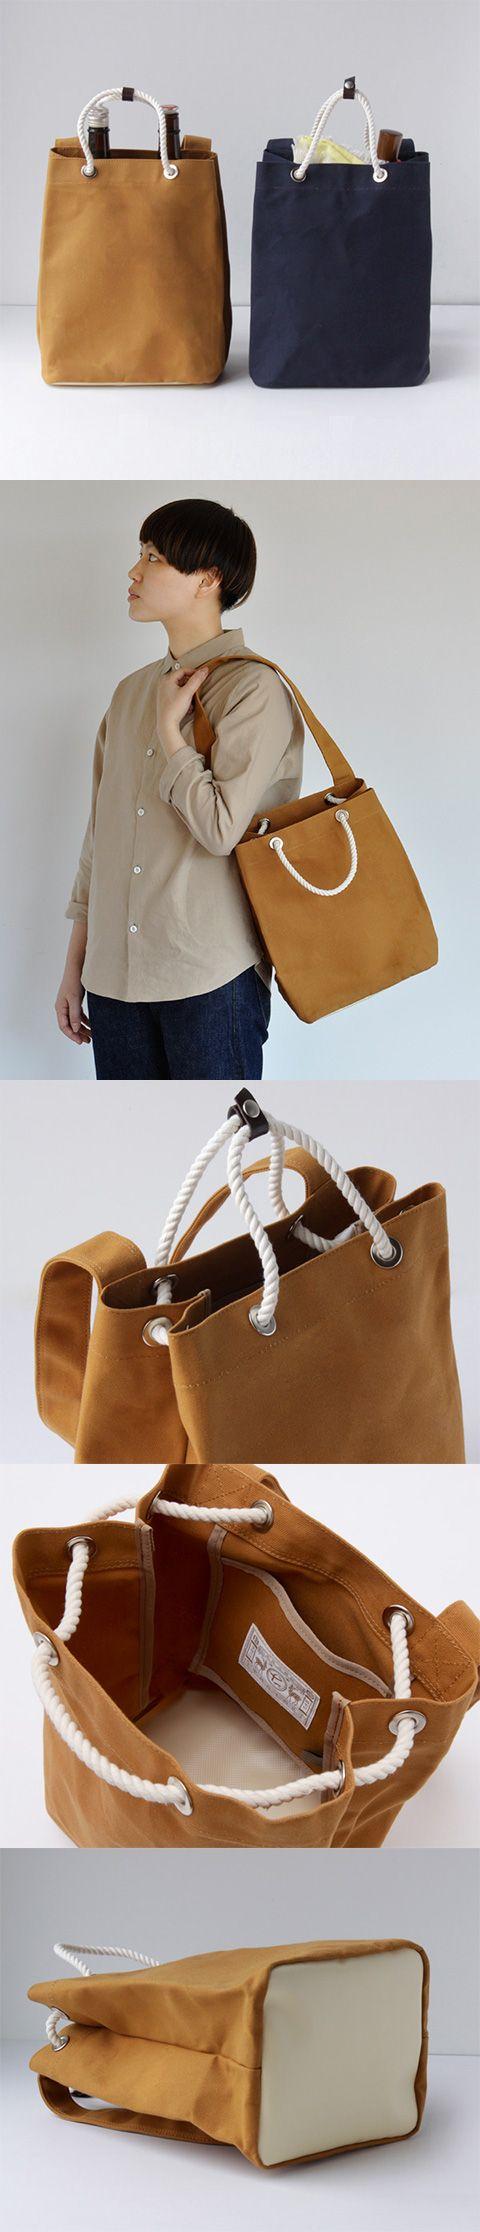 【BAGWORKSコラボ酒屋男(中川政七商店)】/BAGWORKSとコラボレーションして「むかしのしごとのかばん」をコンセプトにかばんを作りました。 酒屋と顧客の間で、酒瓶の運搬用として用いられた通い袋。 一般に帆布など厚手の生地製で、耐久性に優れた昔のエコバッグです。 通い袋のシンプルな機能に更に使いやすさをプラスし、日常にお使いいただけるバッグを作りました。 #bag #bagworks